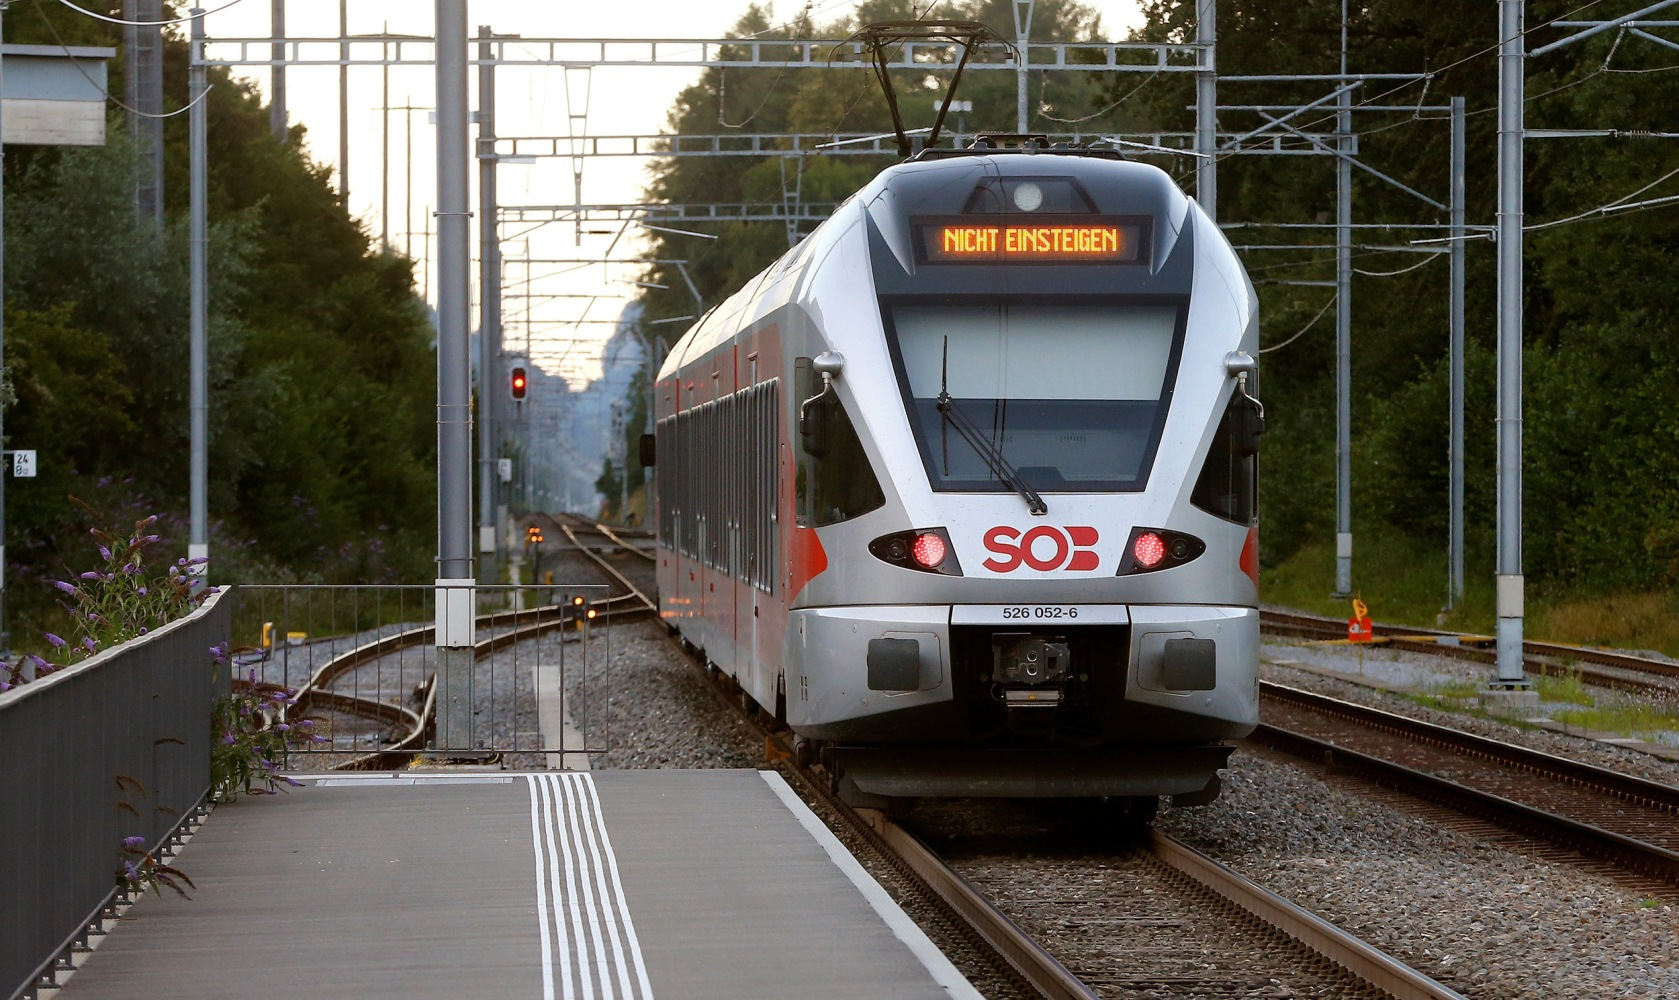 news world europe attack swiss train knife injured passengers fire latest